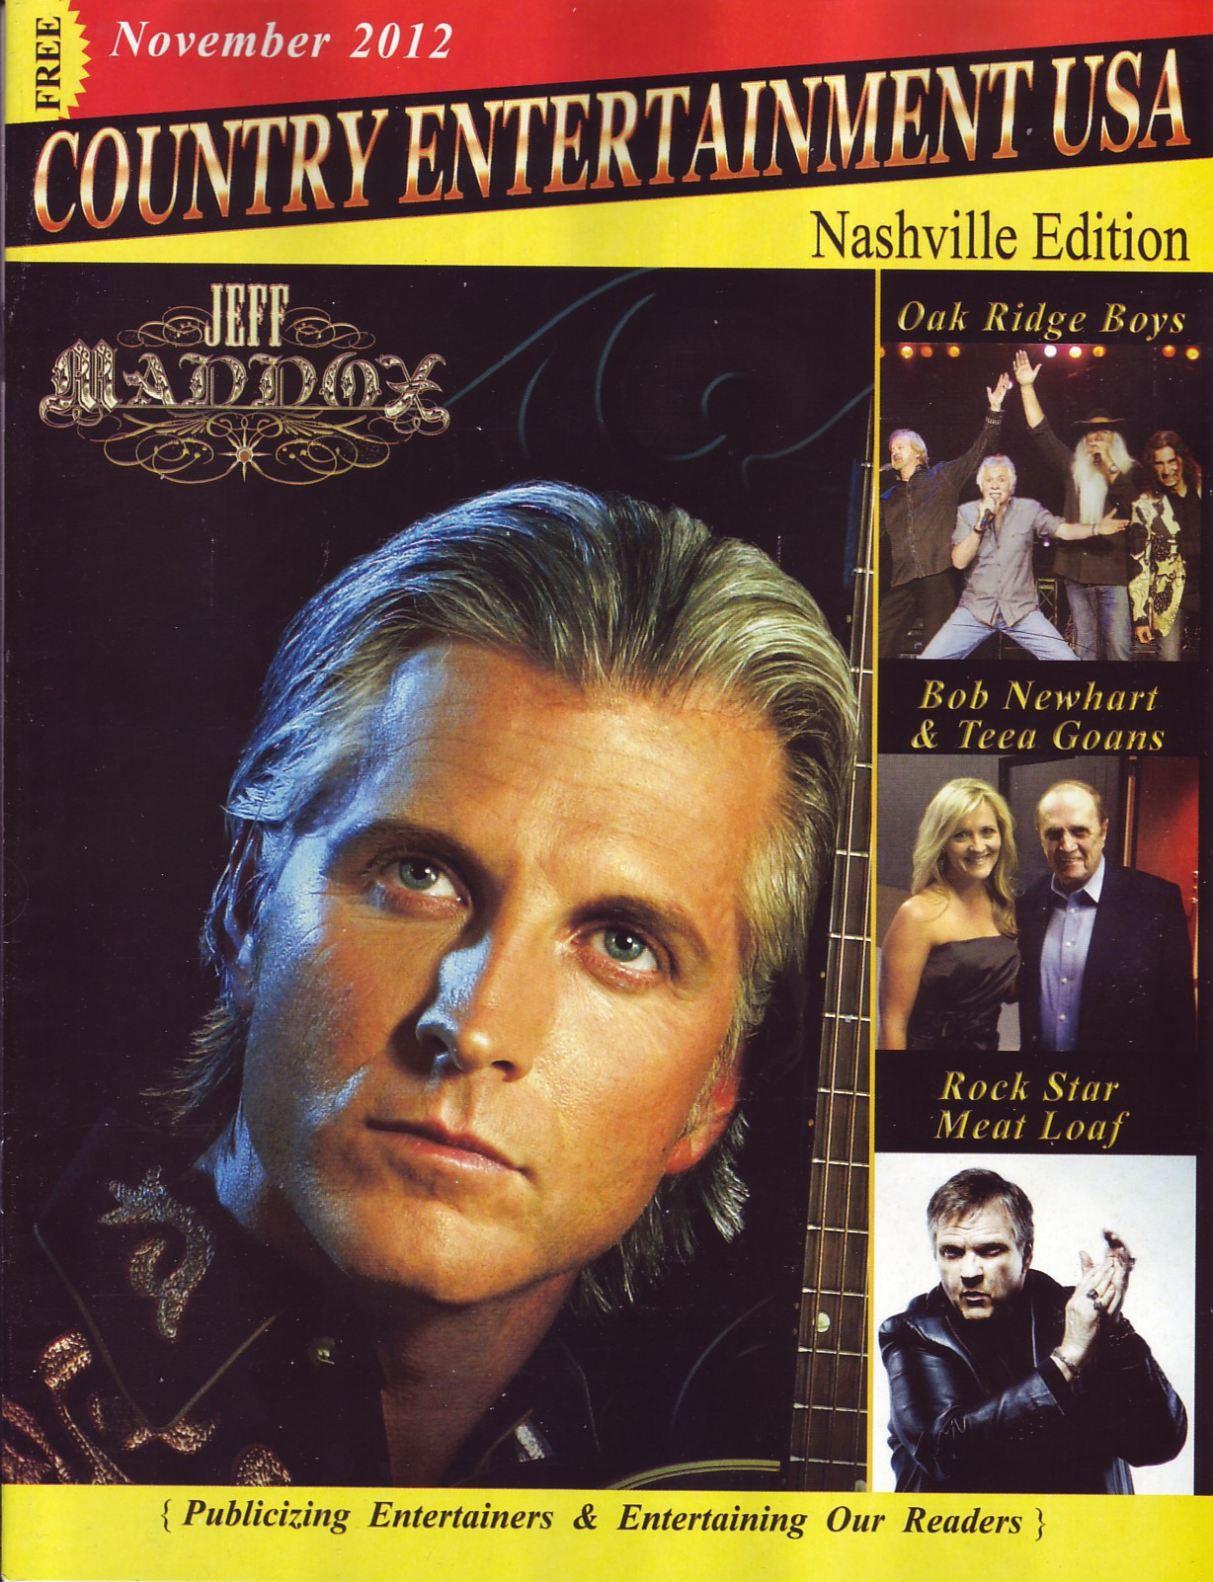 Jeff Maddox Magazine Cover